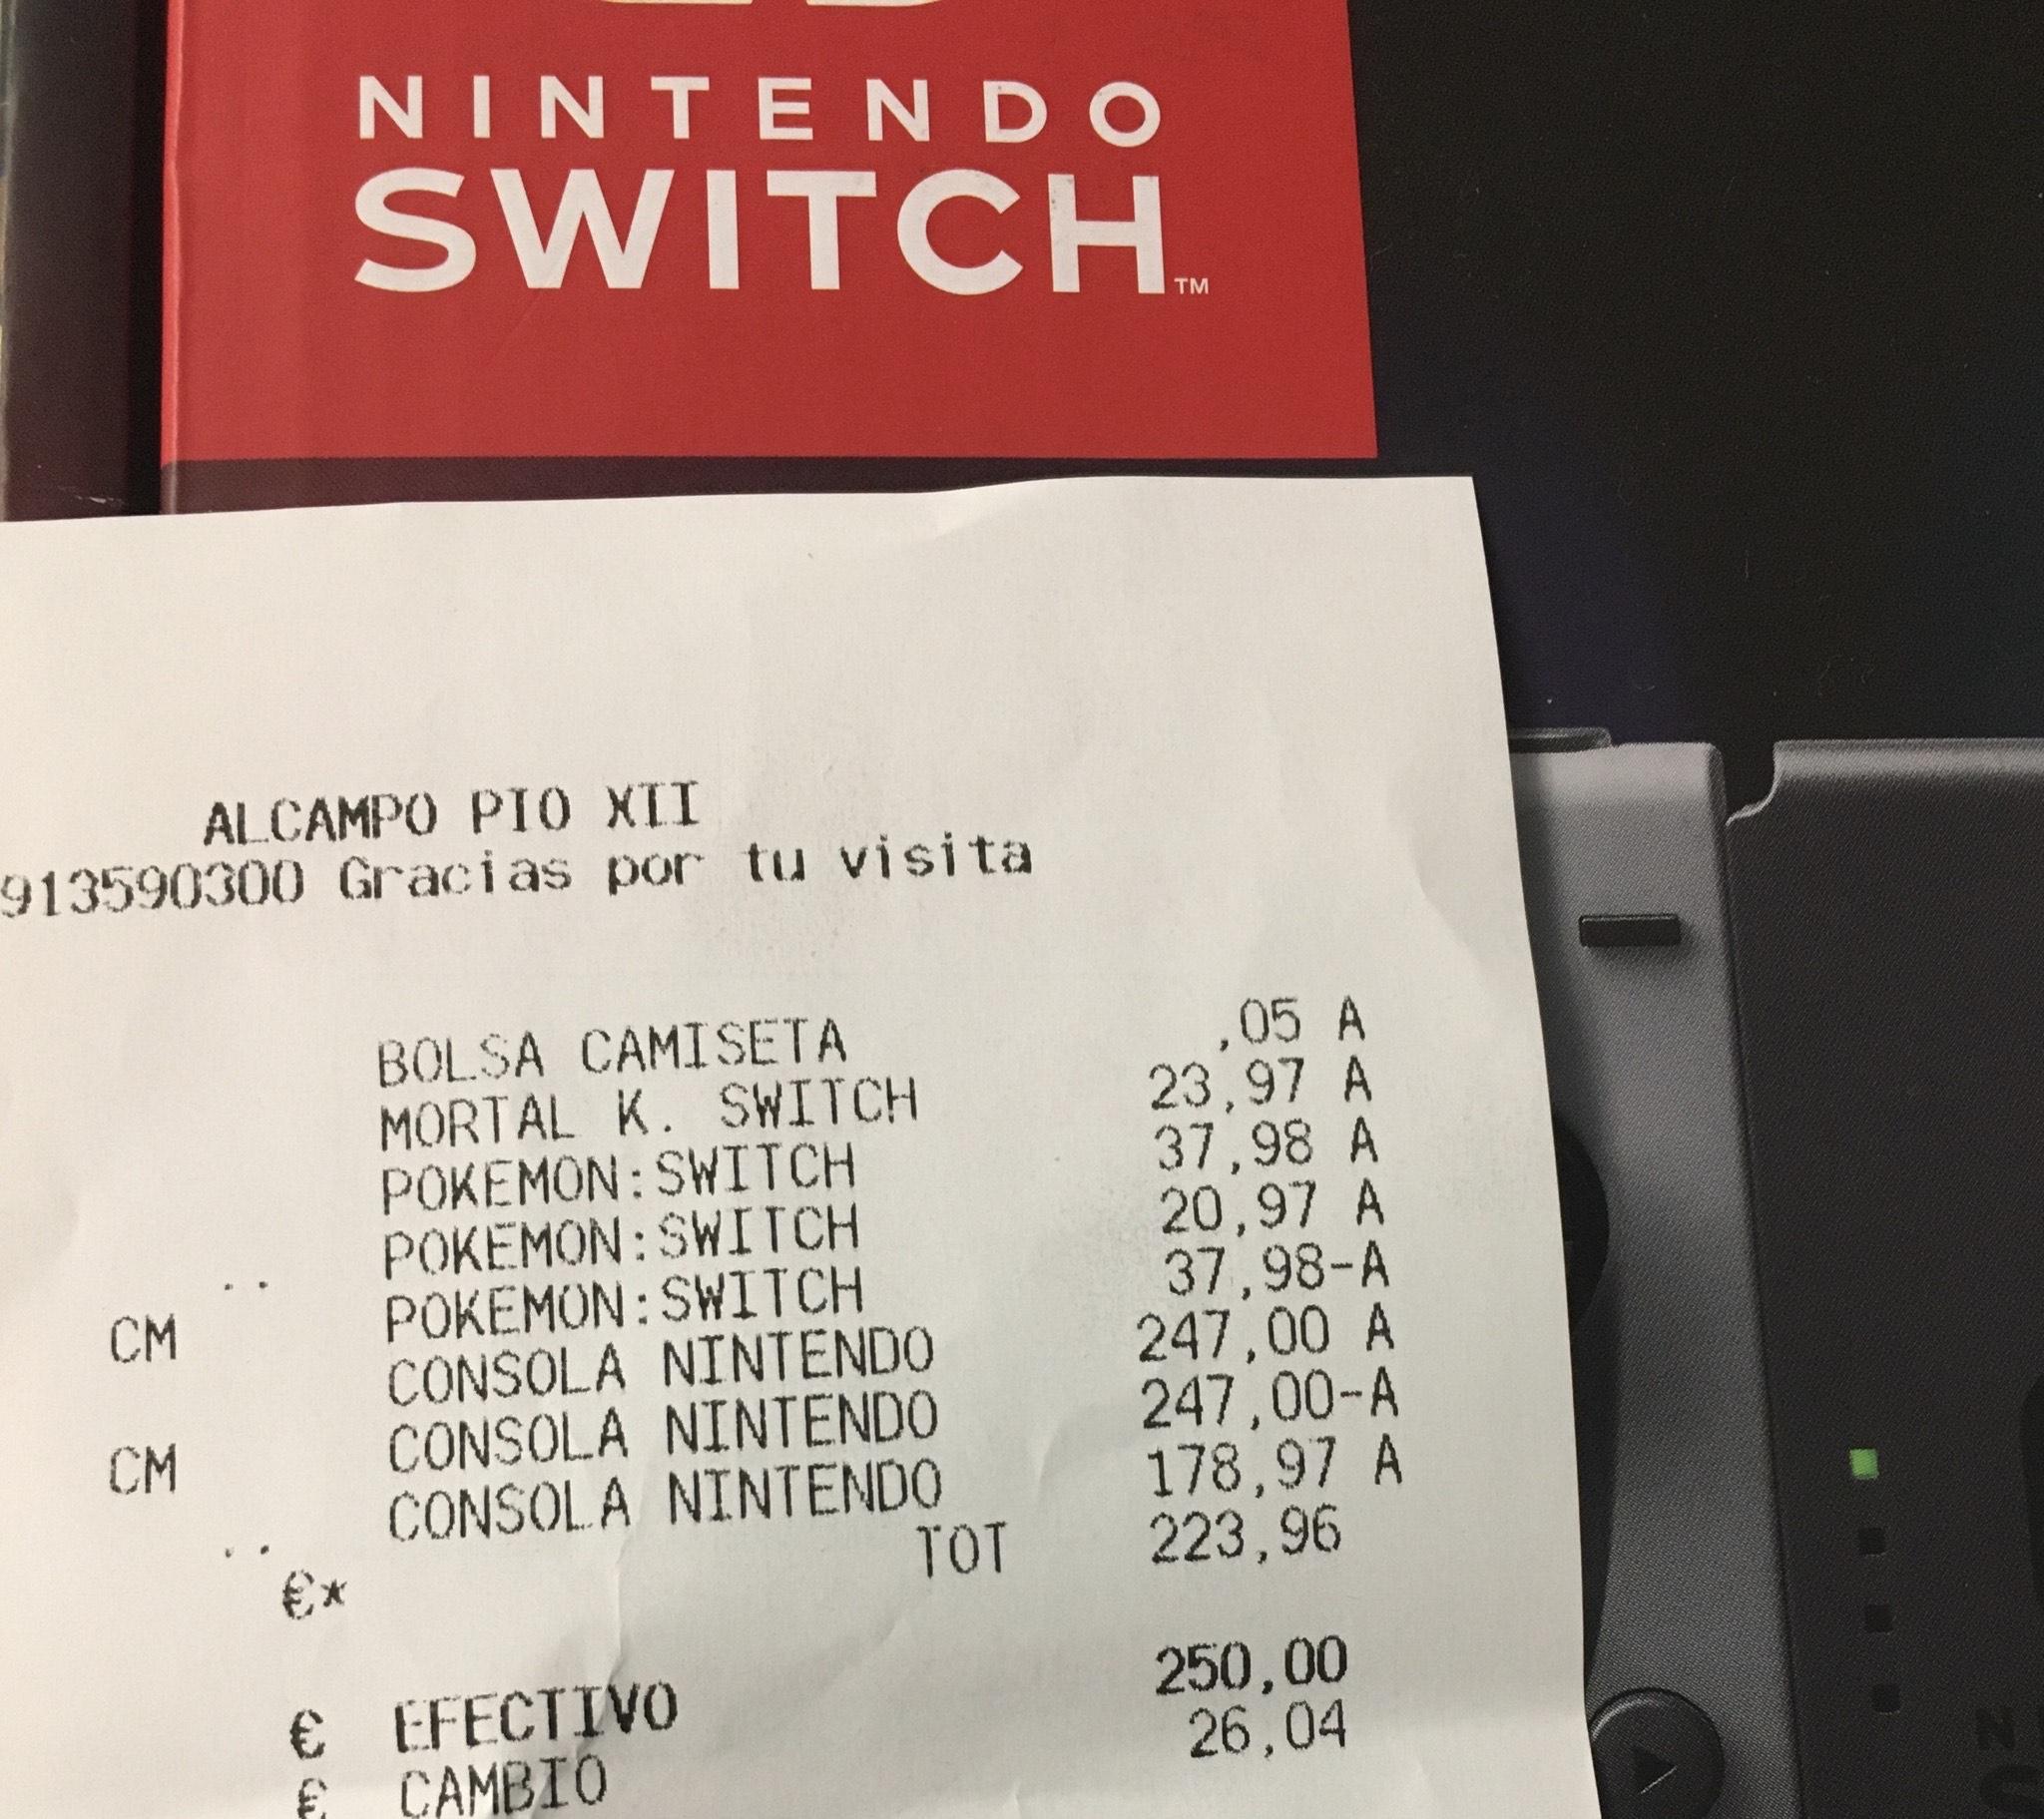 Mínimo histórico Nintendo switch gris (AlCampo)